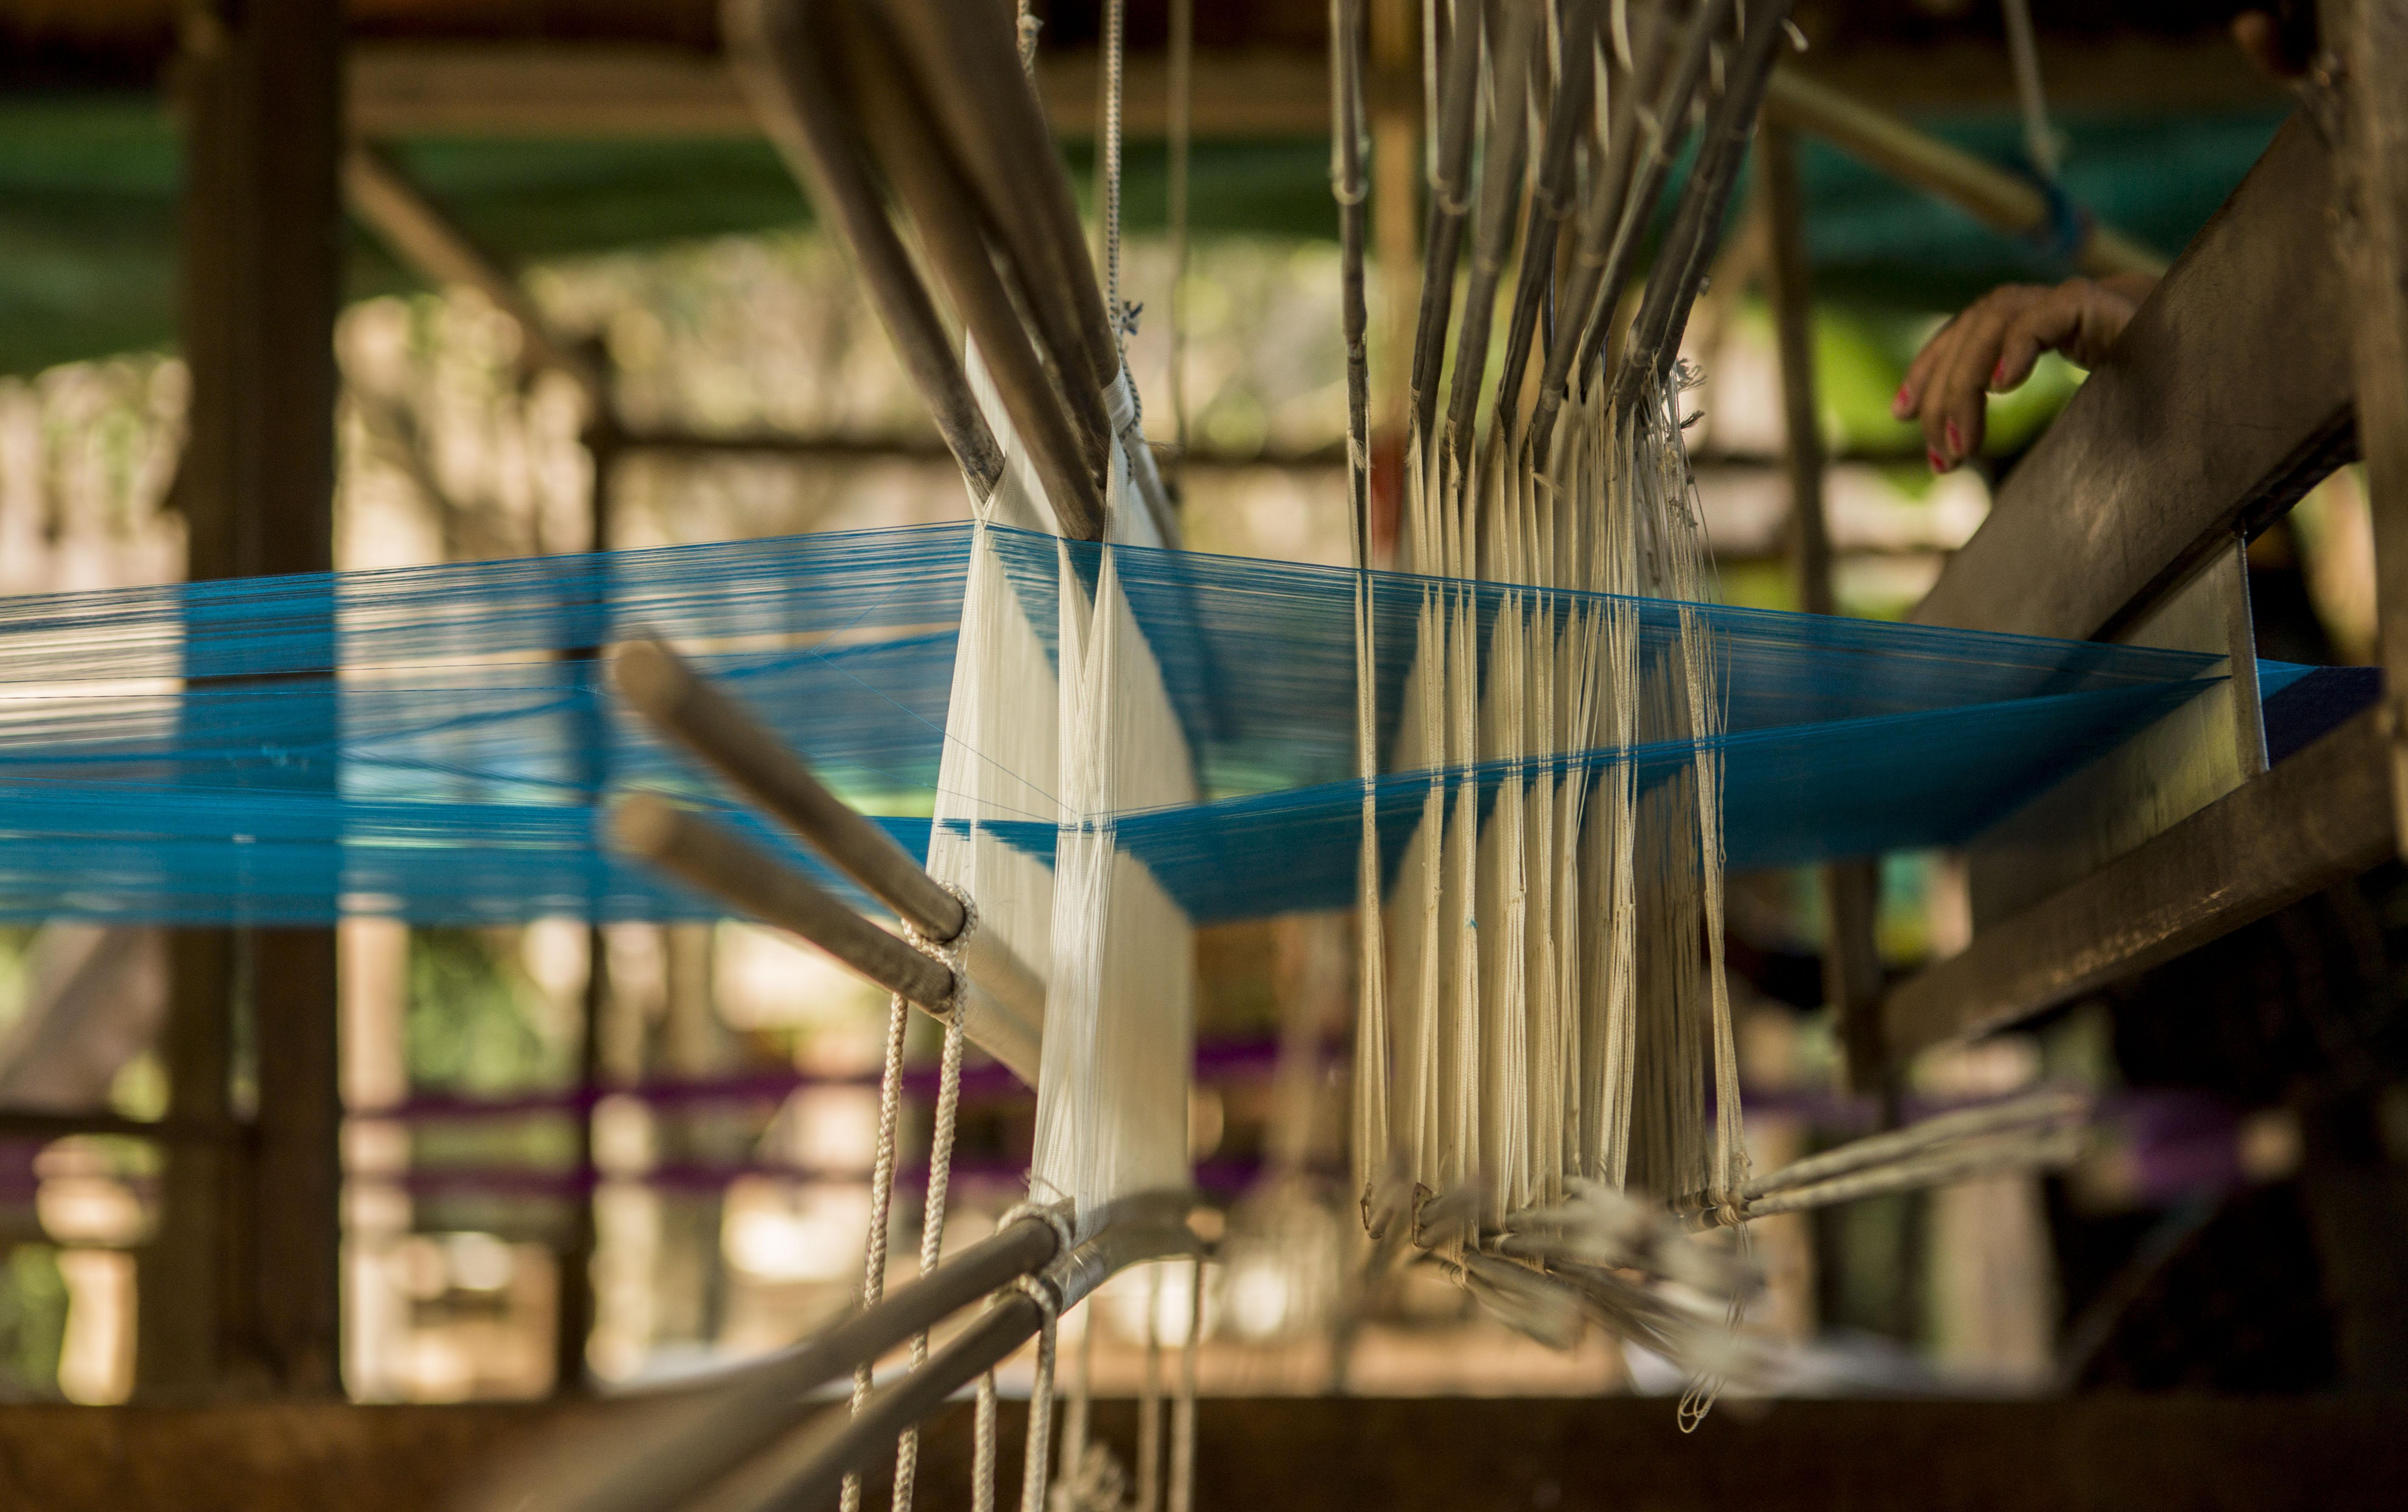 Weaving work